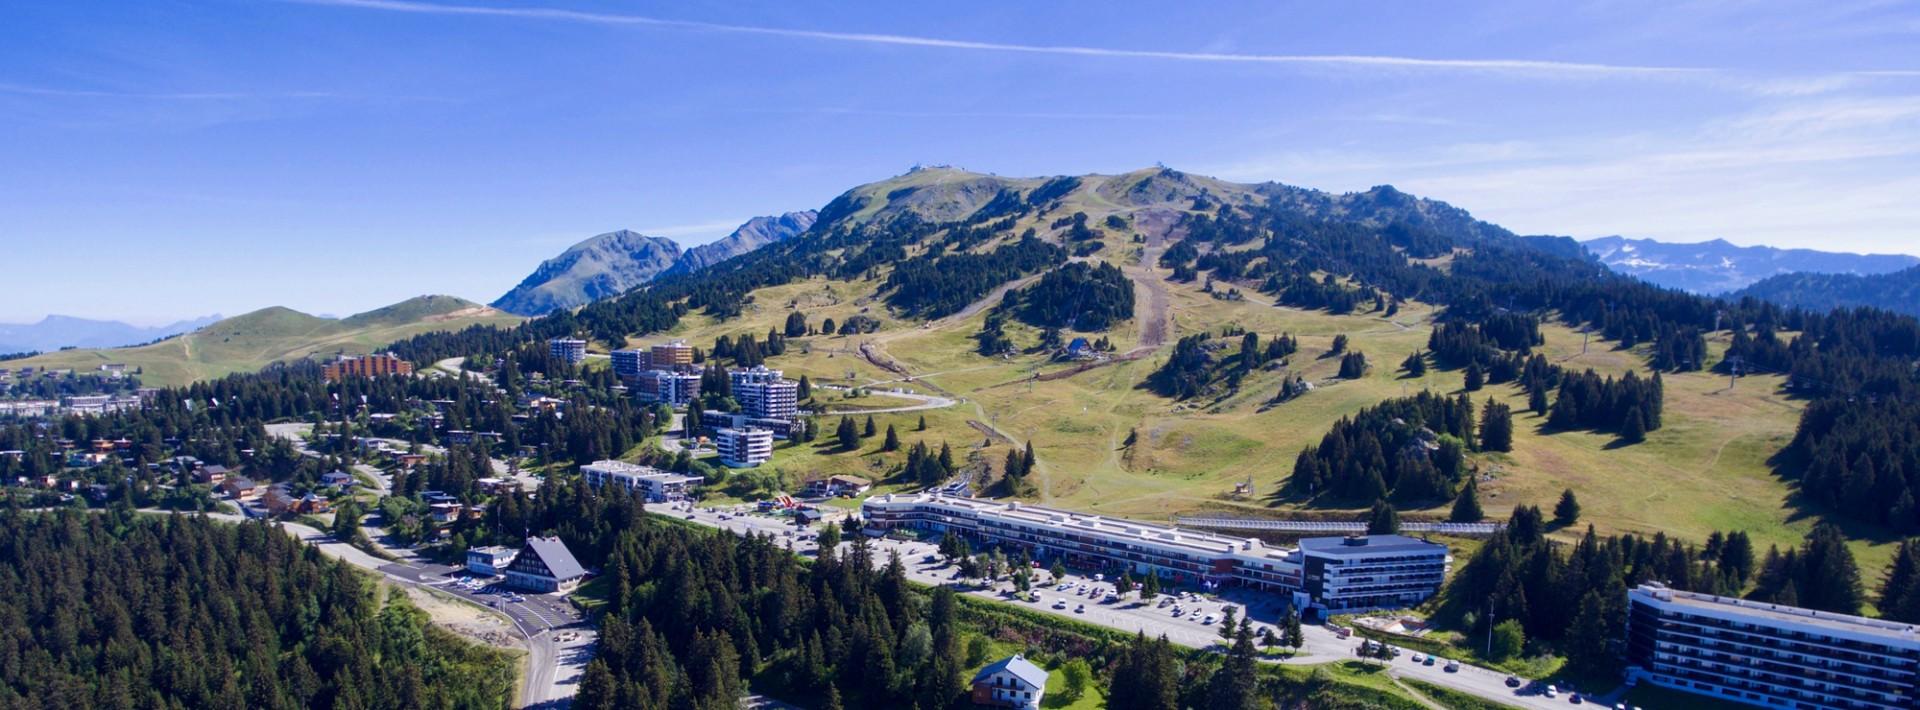 Chamrousse station montagne